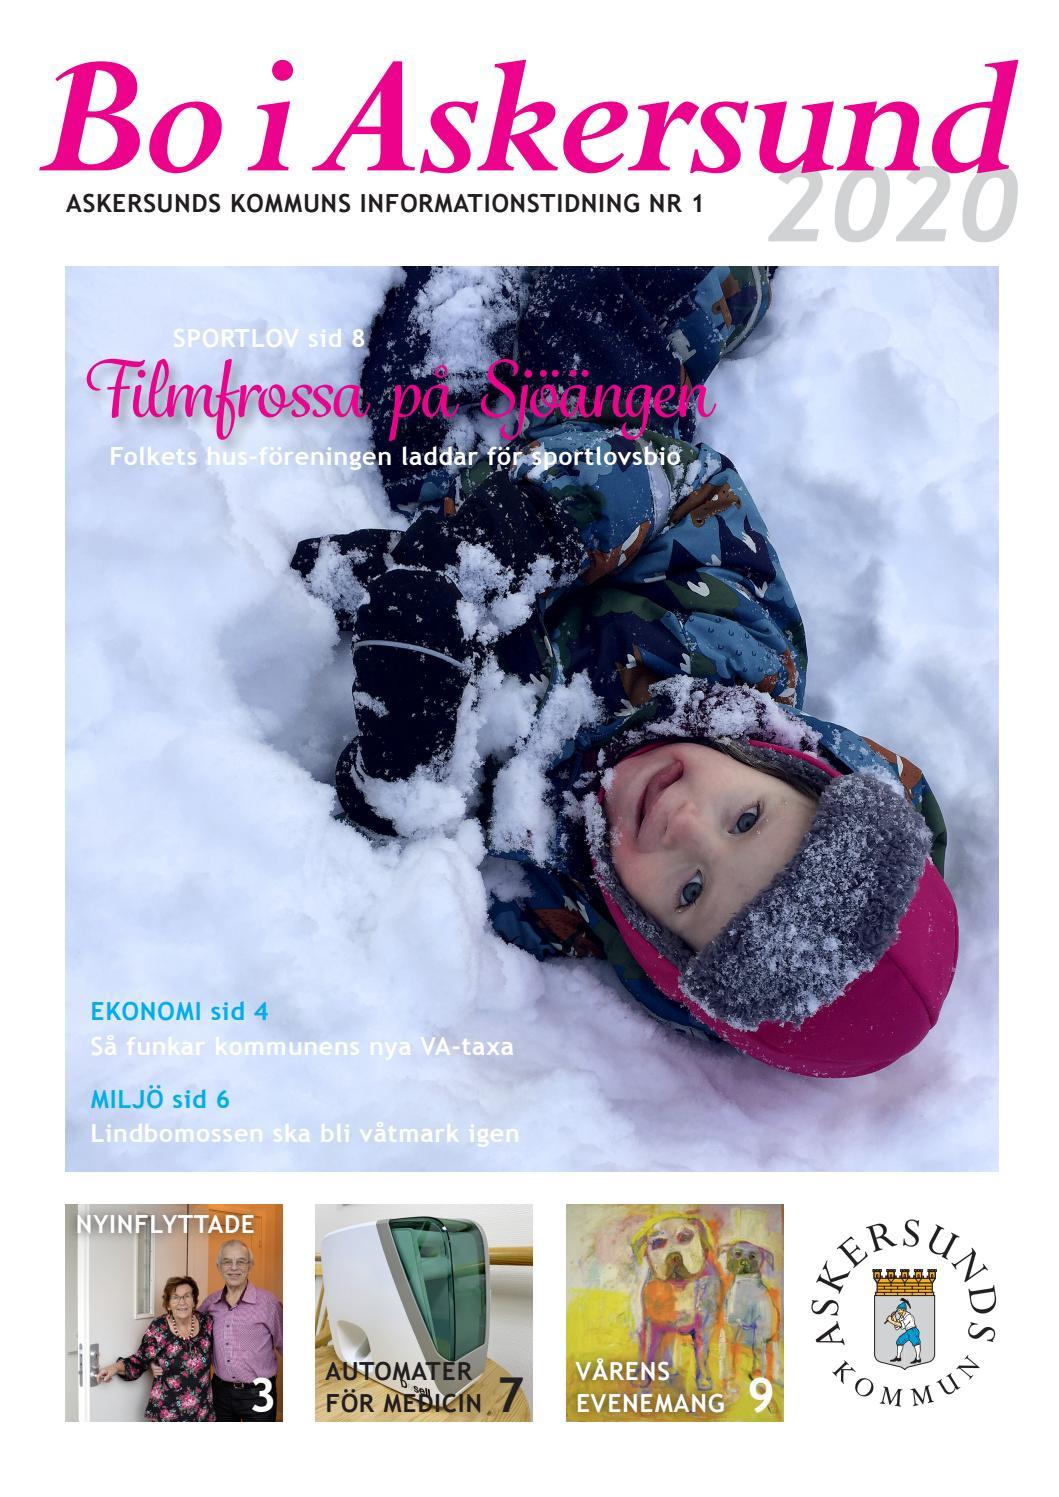 Nyinflyttade p Tycke, Askersund | satisfaction-survey.net